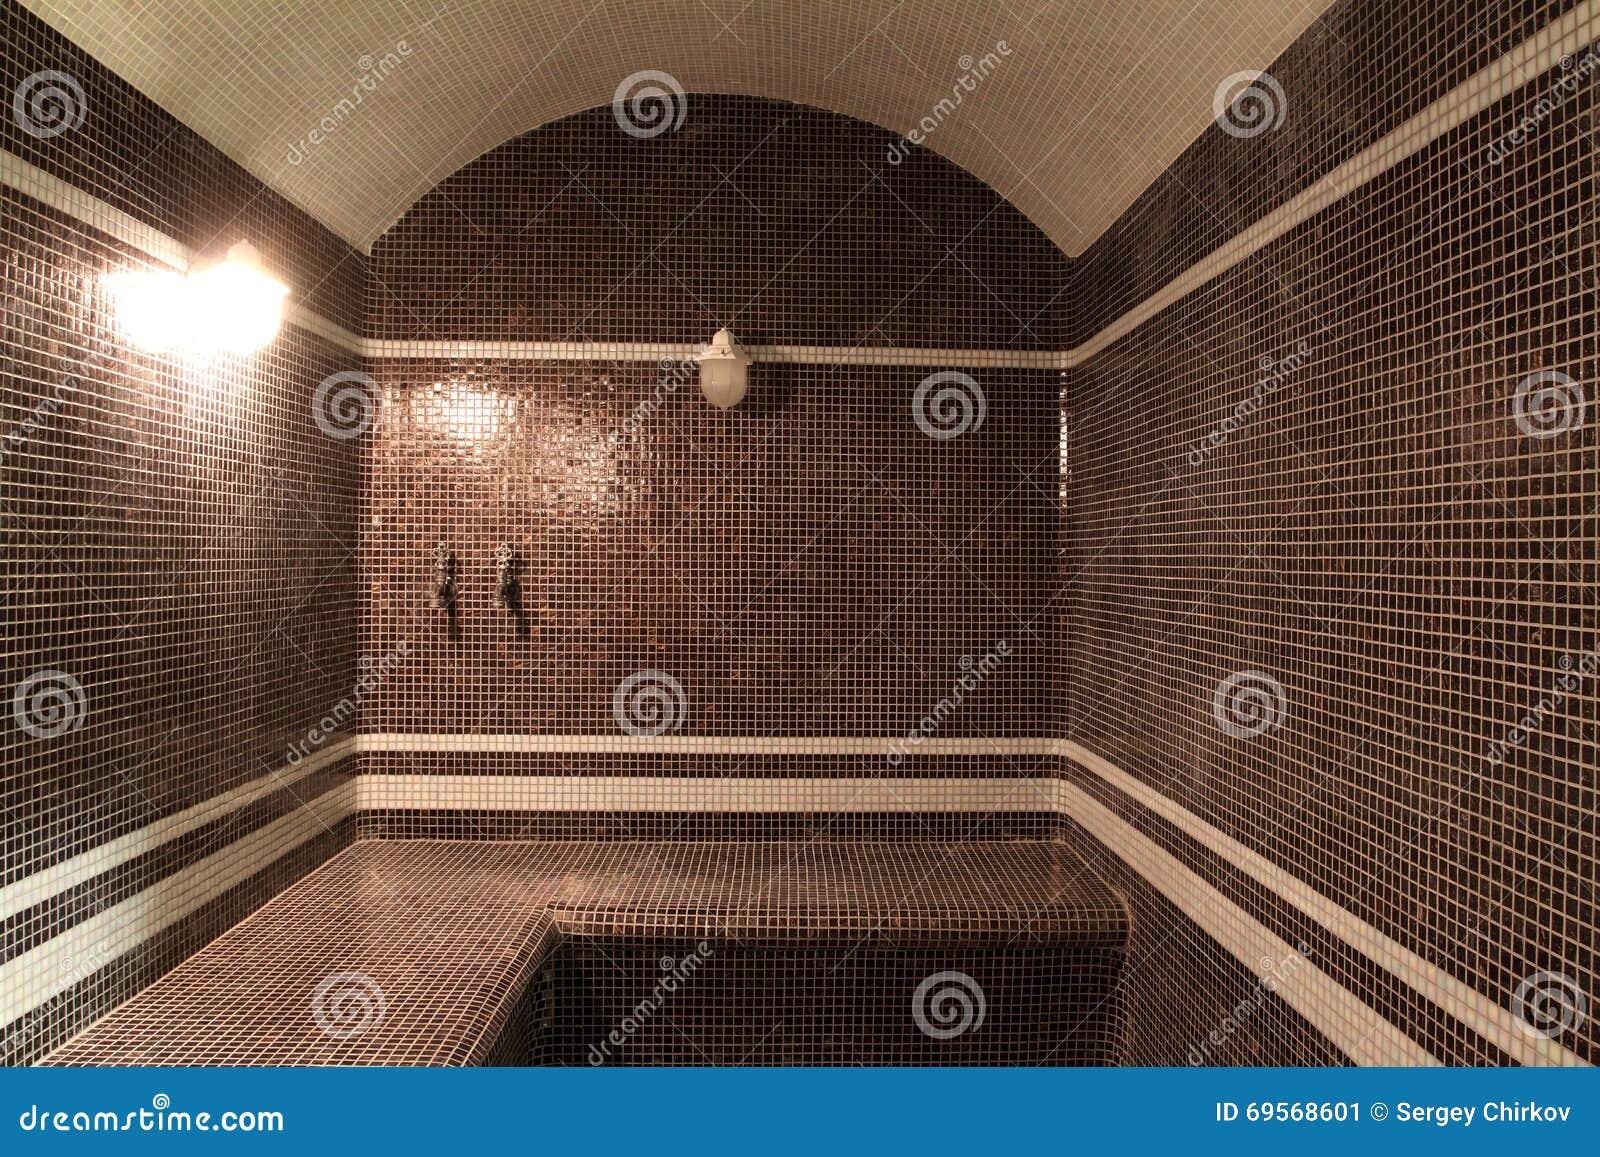 Hammam Style the turkish sauna hammam stock image. image of culture - 69568601